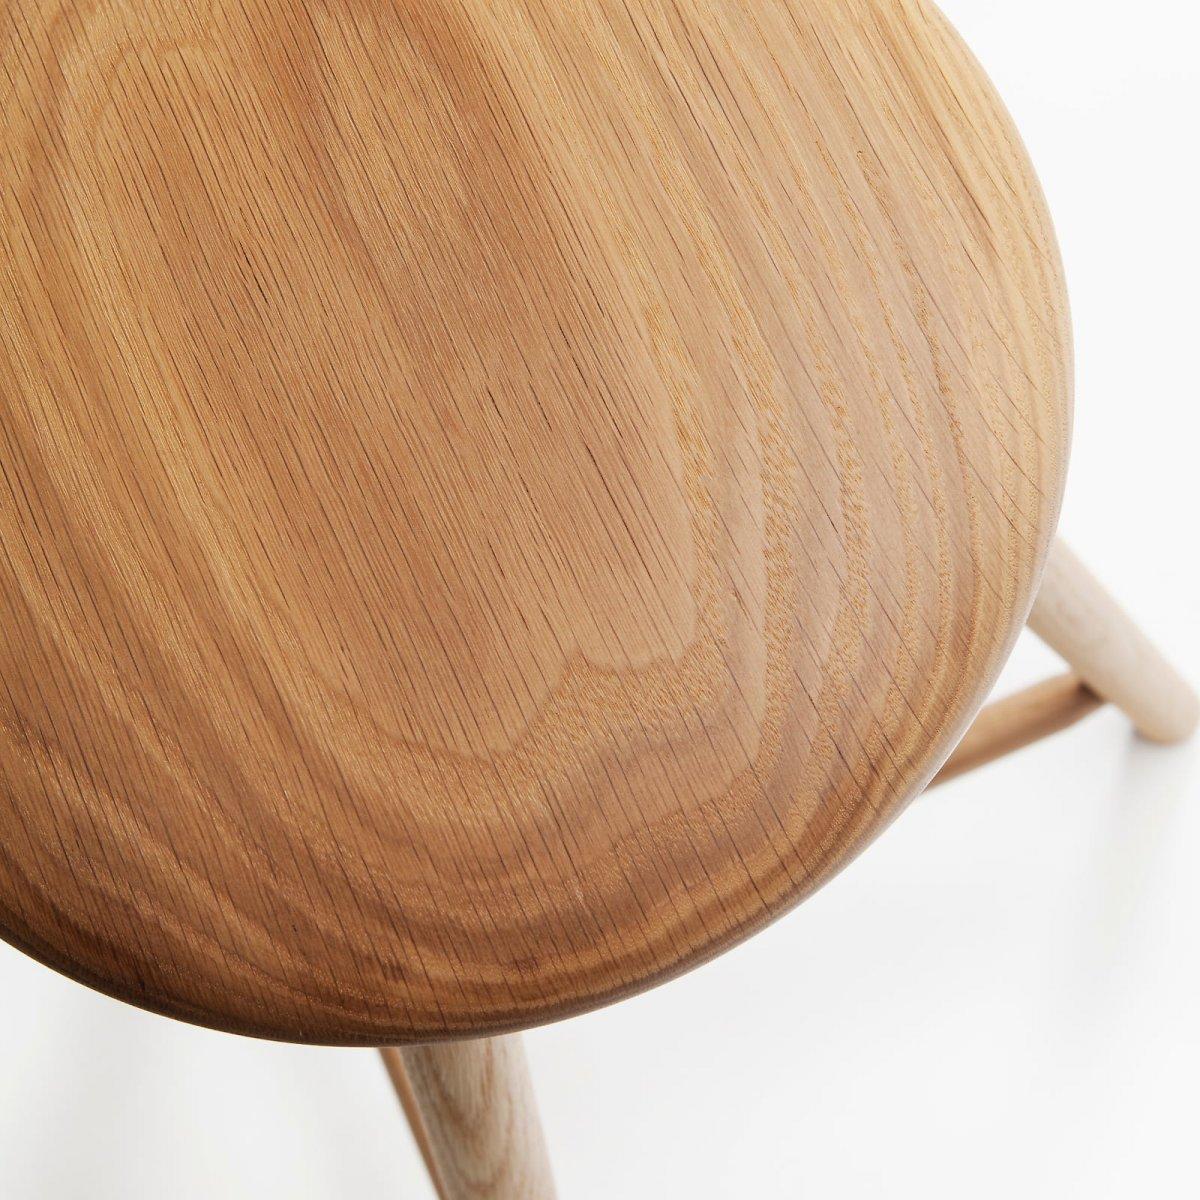 Perch Stool, natural wood oil, detail.